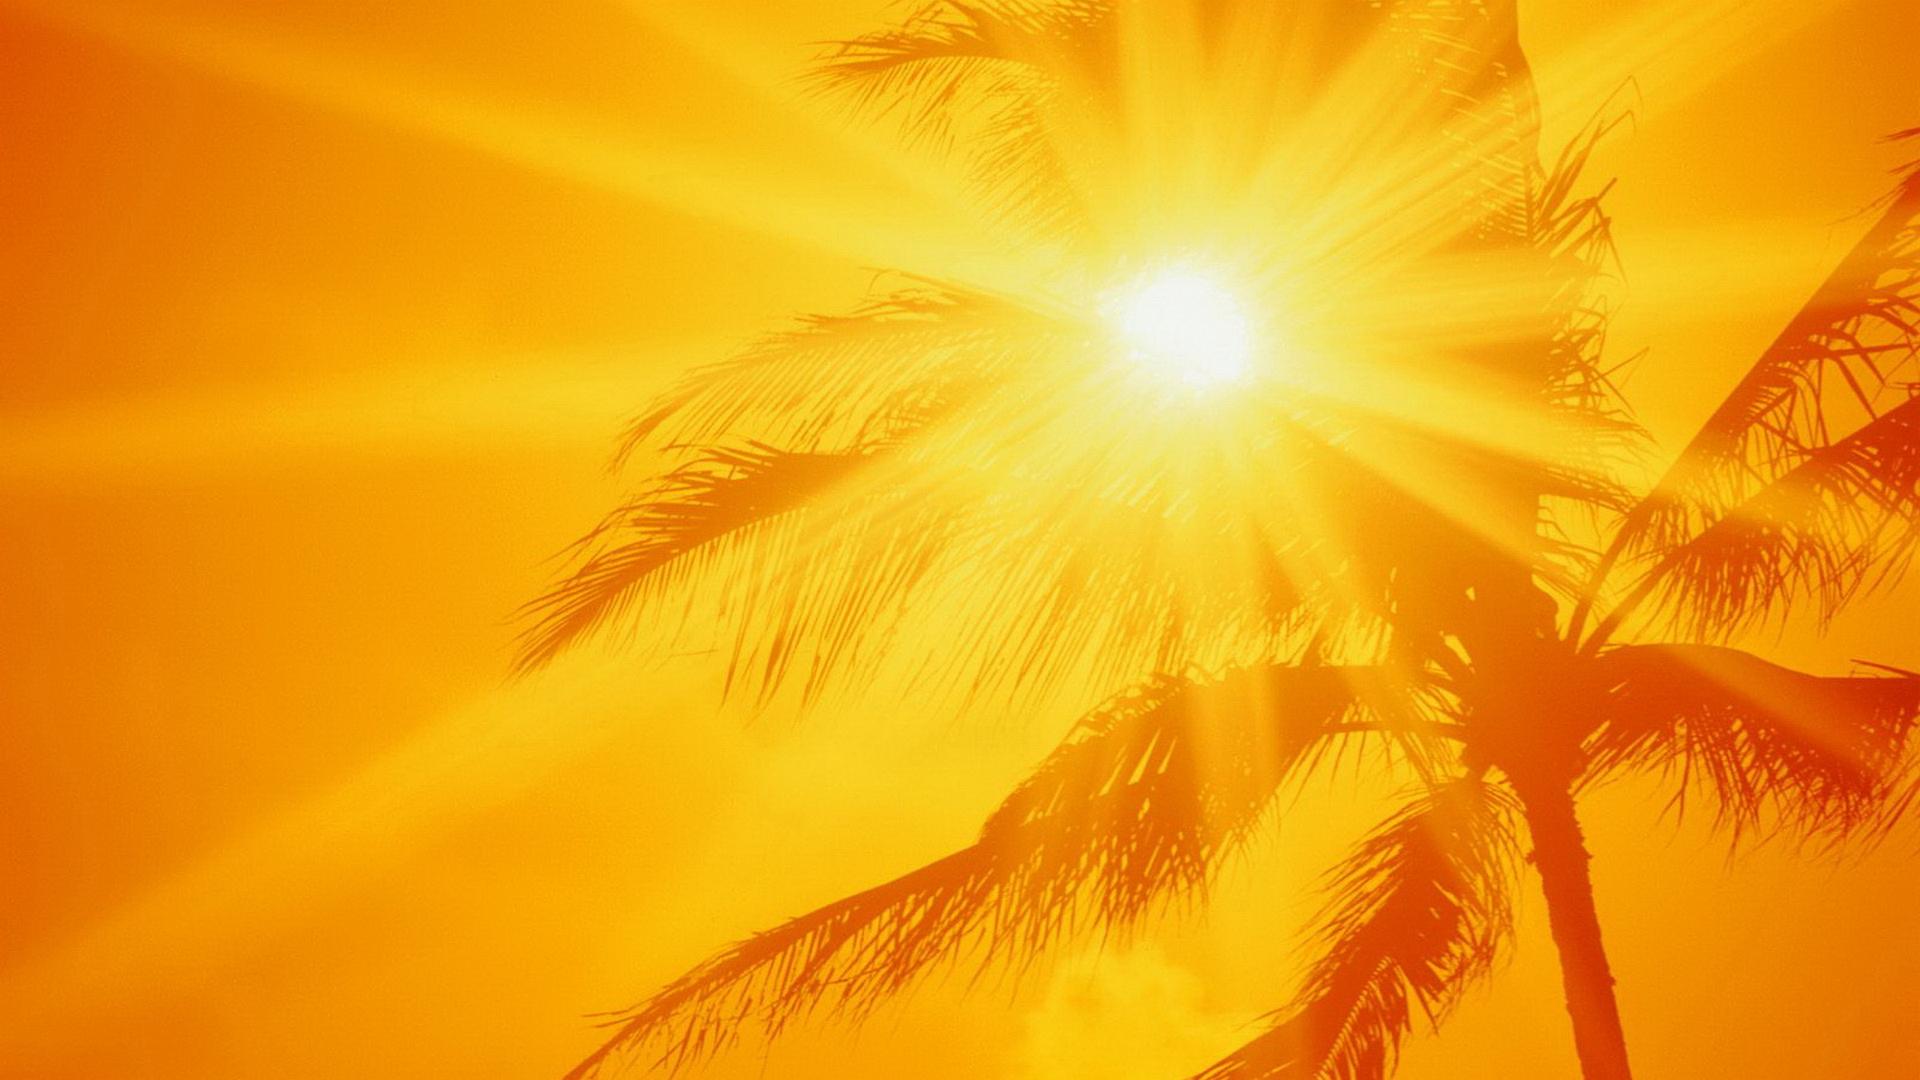 The Summer Heat Google Skins Feel The Summer Heat Google Backgrounds 1920x1080